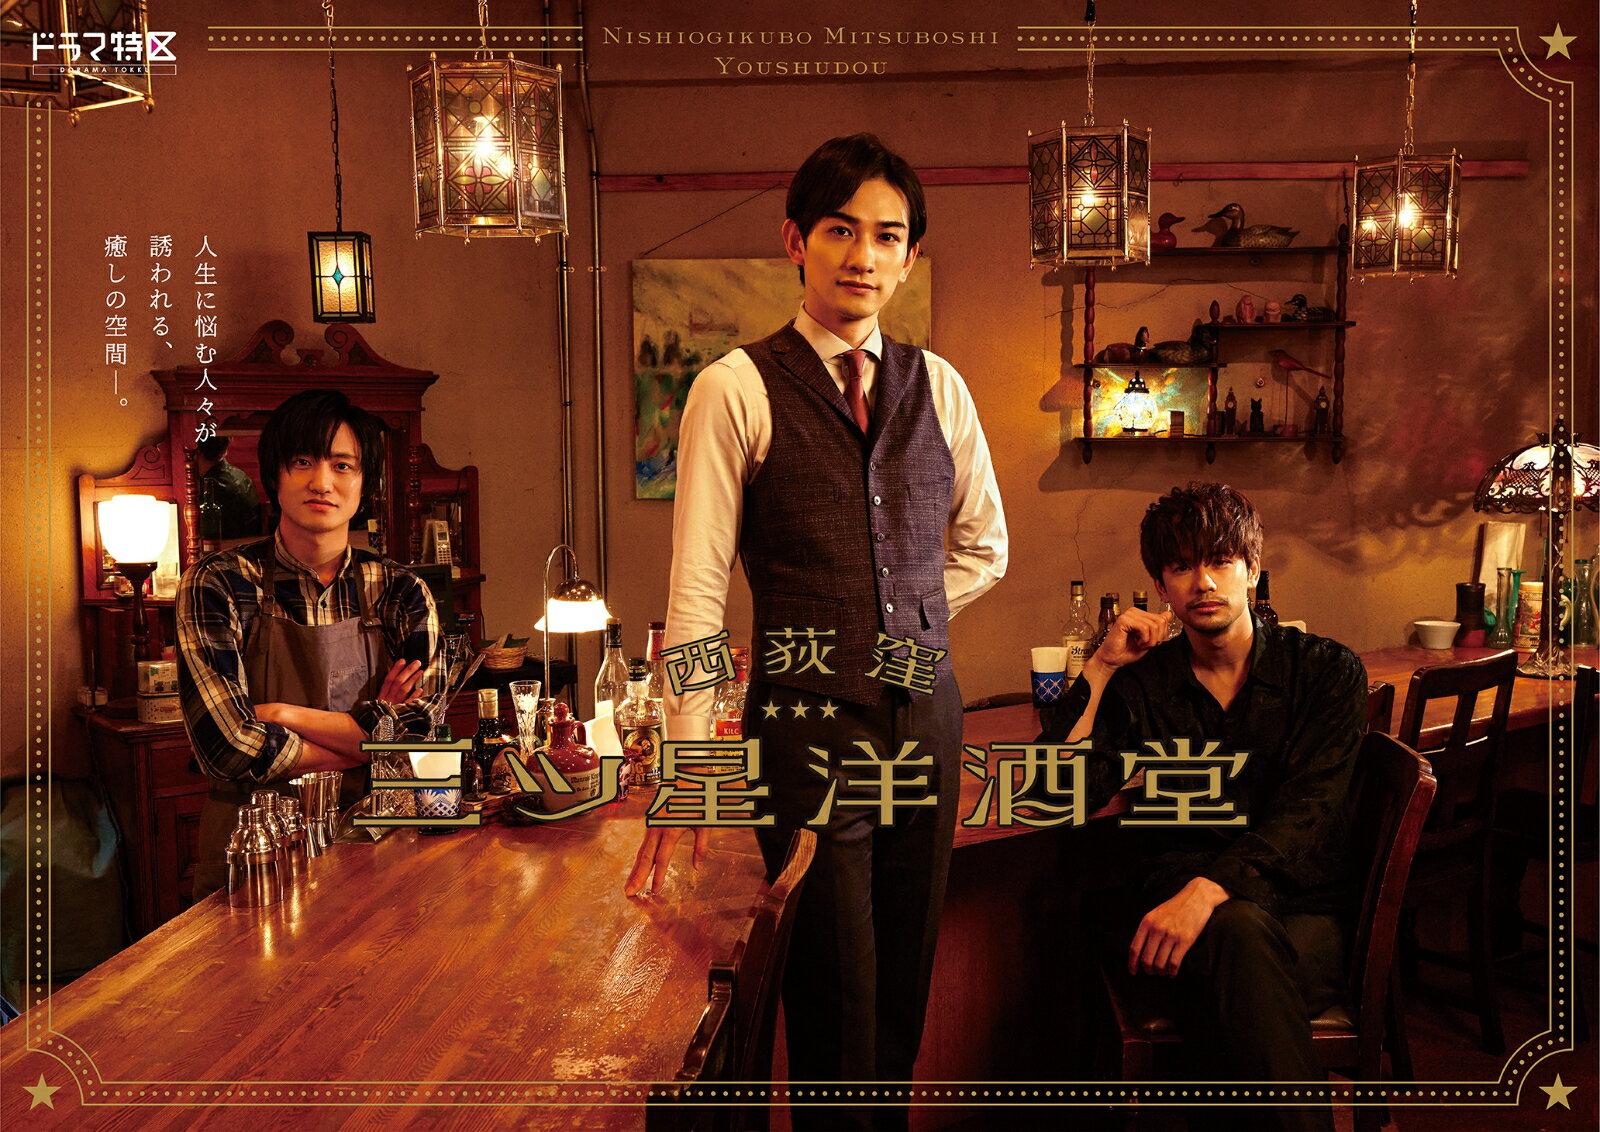 西荻窪 三ツ星洋酒堂 Blu-ray BOX【Blu-ray】